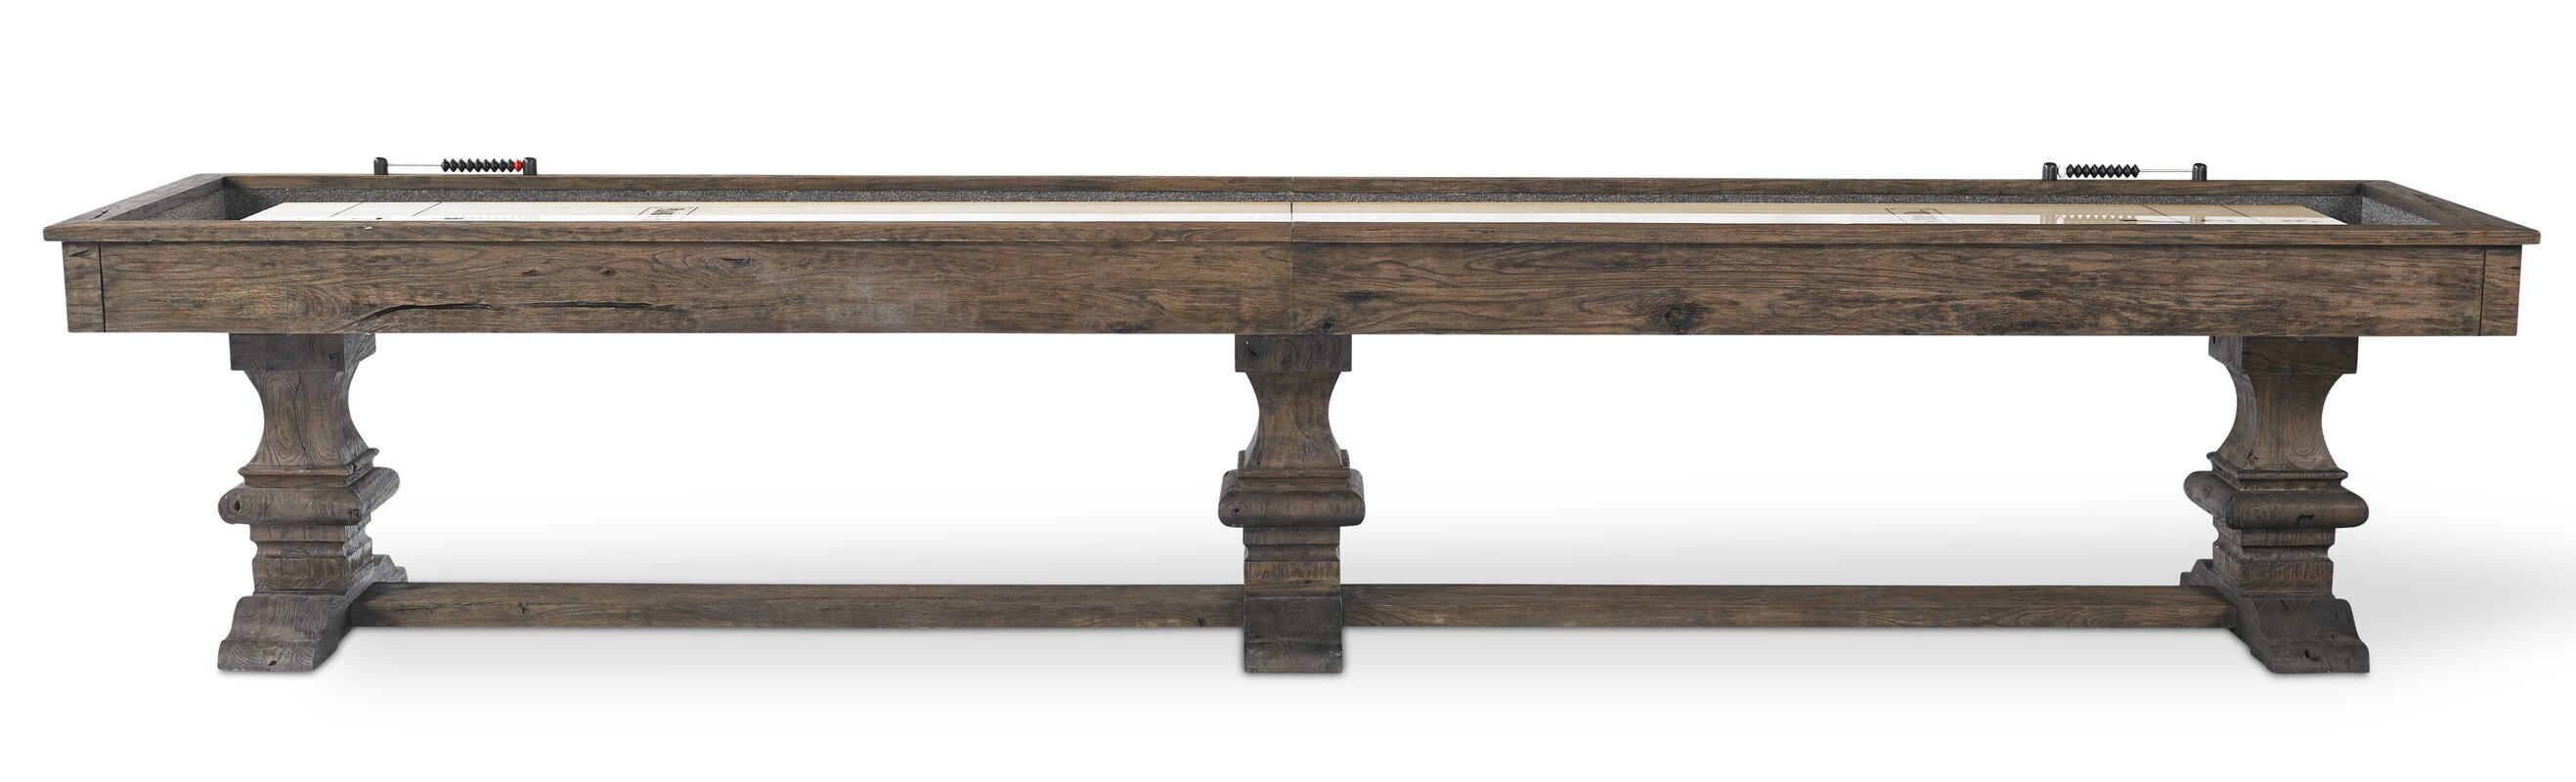 Beaumont Shuffleboard Table